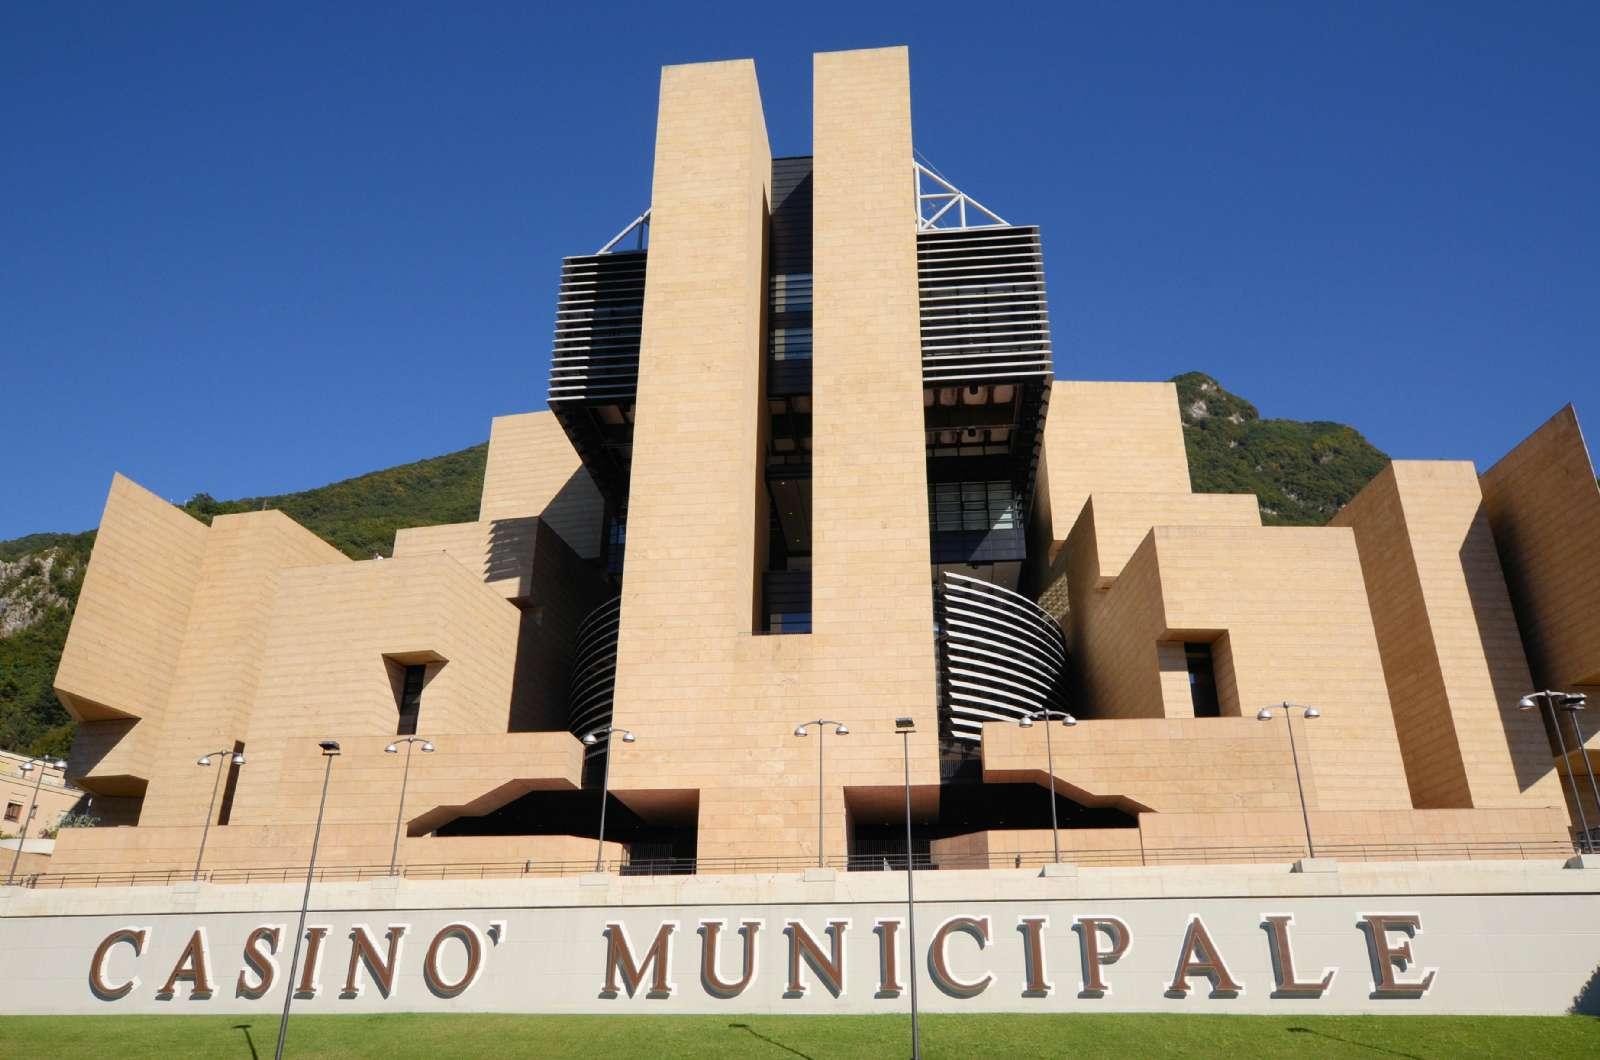 Byens monumentale kasino